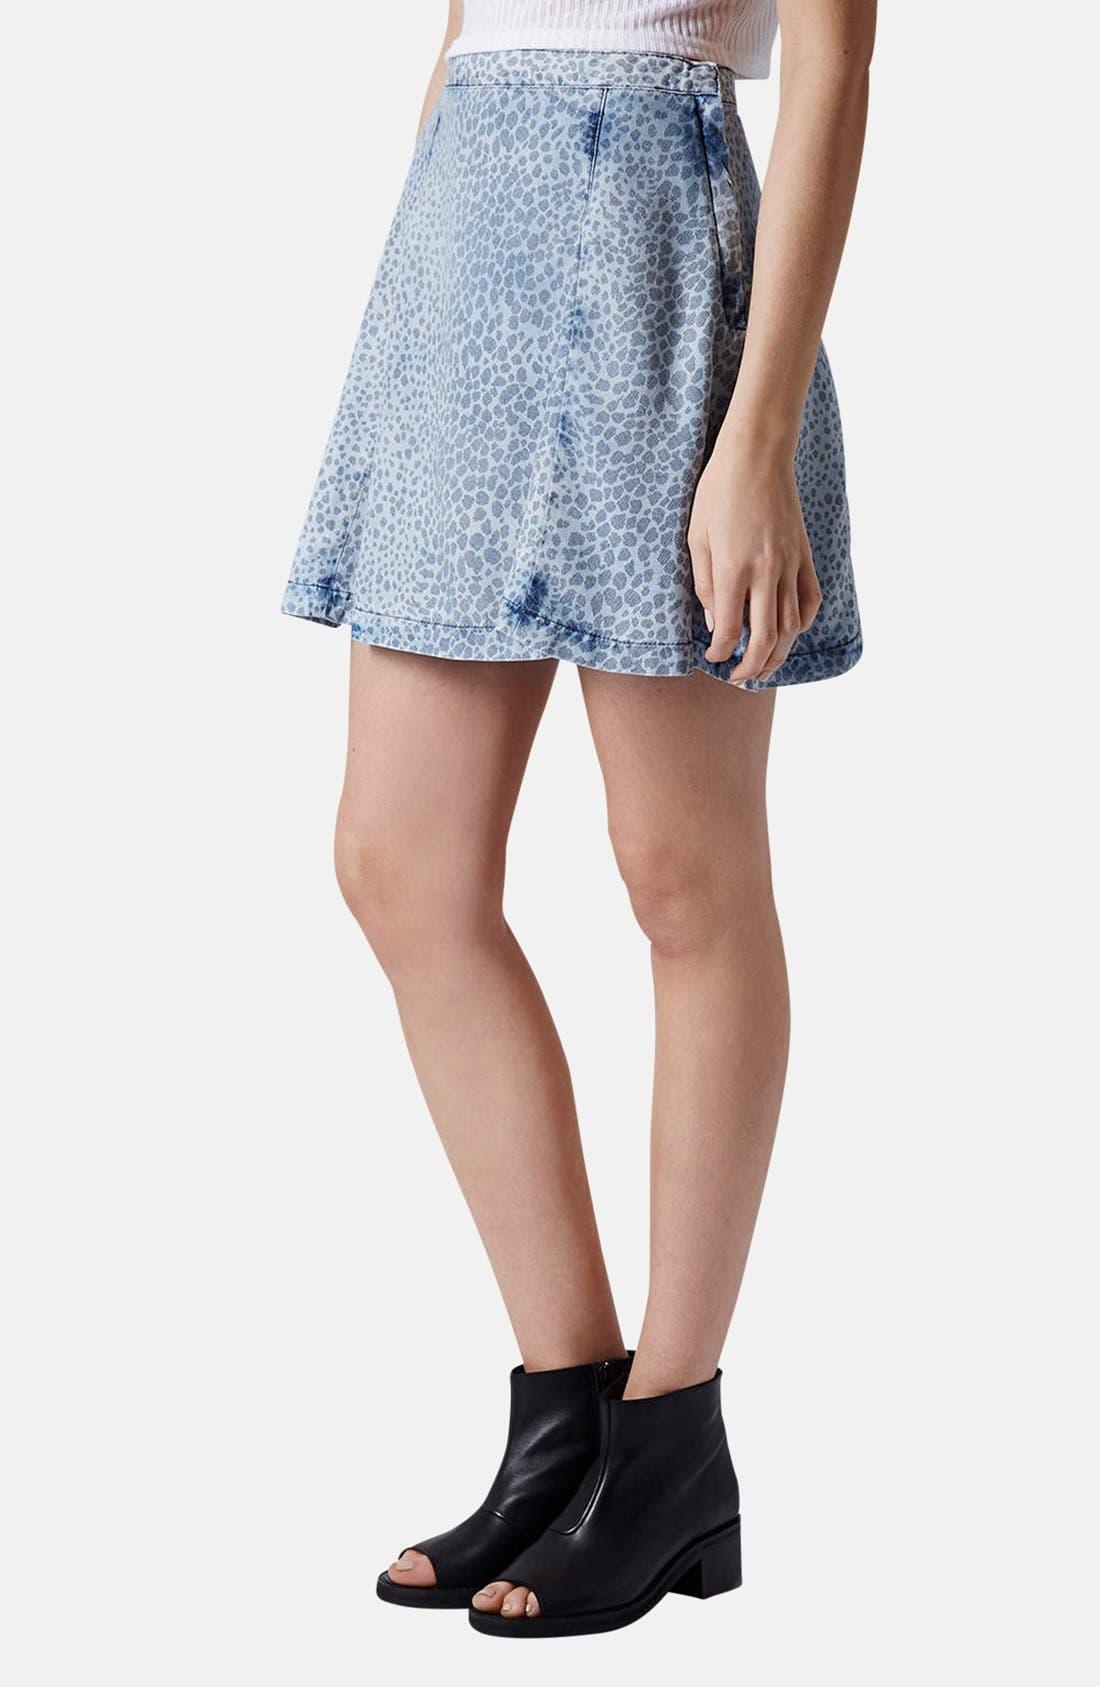 Alternate Image 1 Selected - Topshop Leopard Print Denim Skater Skirt